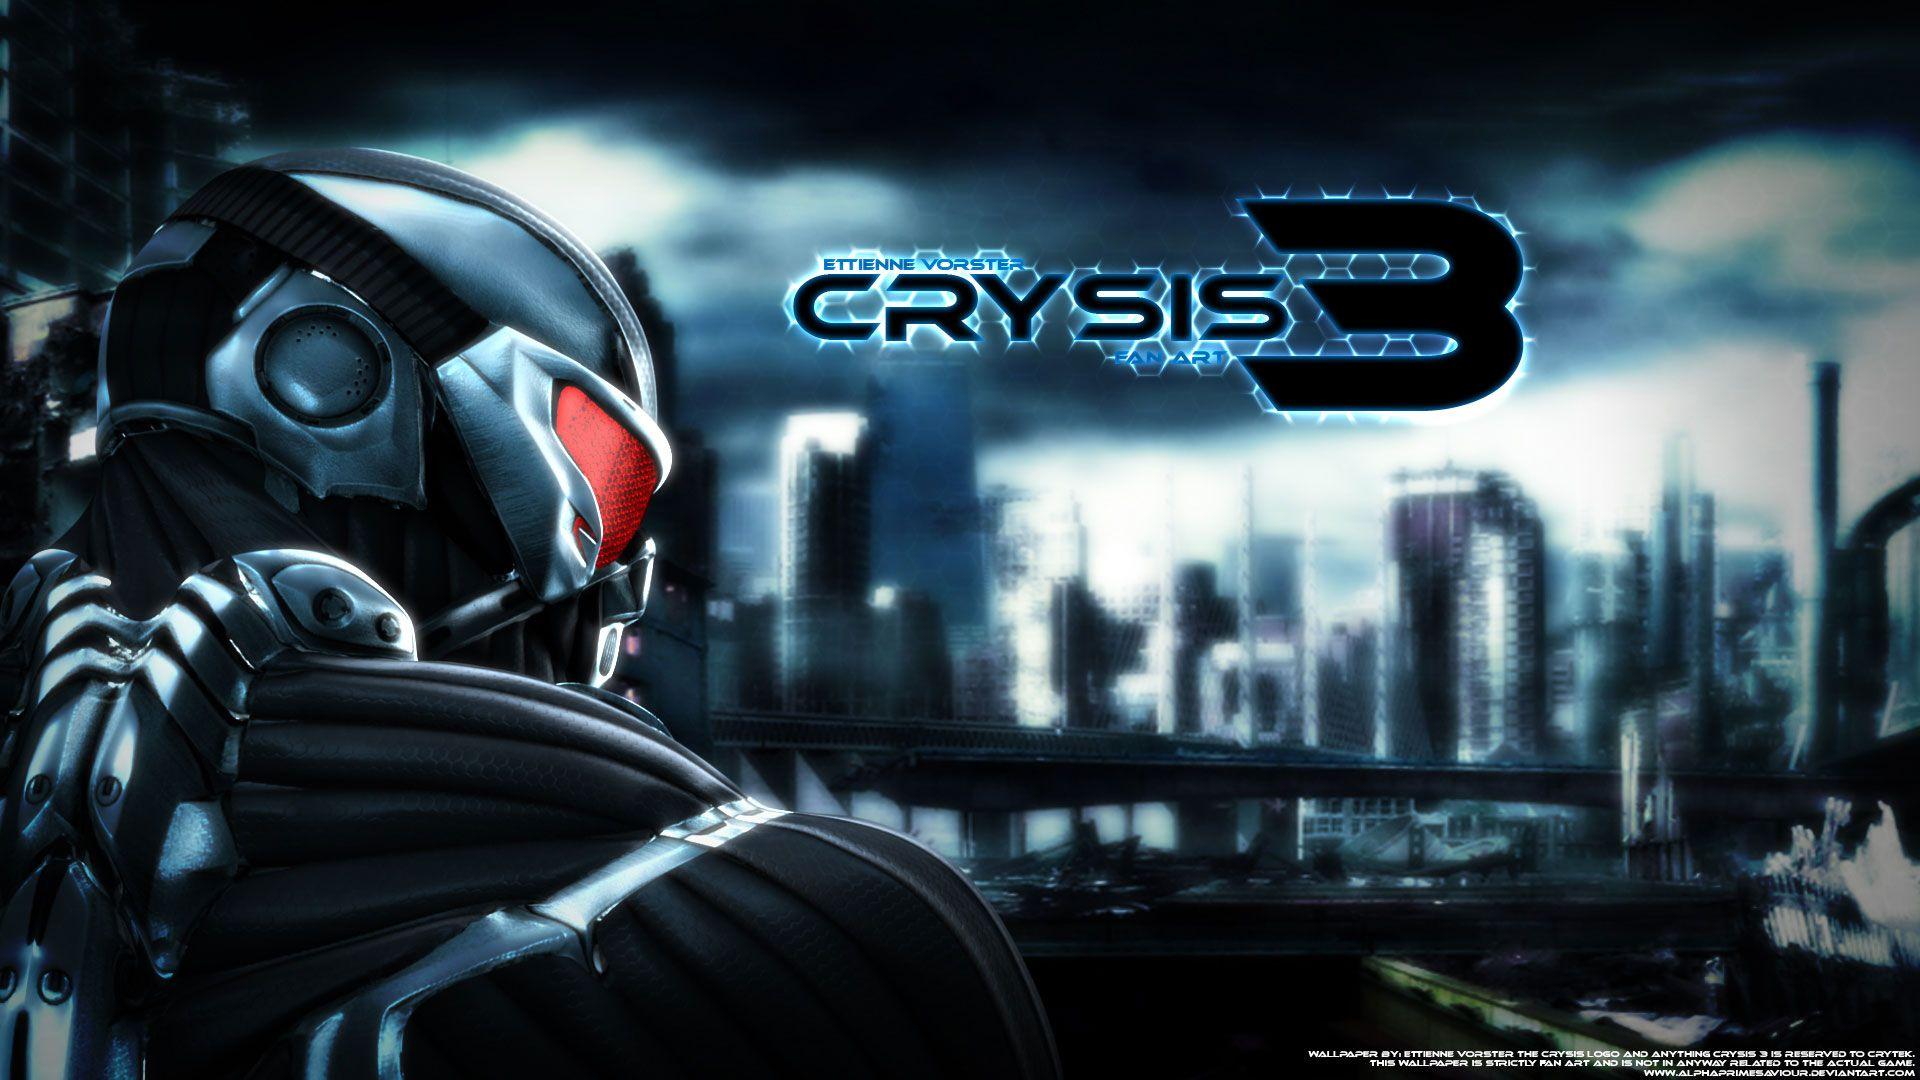 crysis 3 exclusive hd game wallpapers for desktop game hd wallpaper